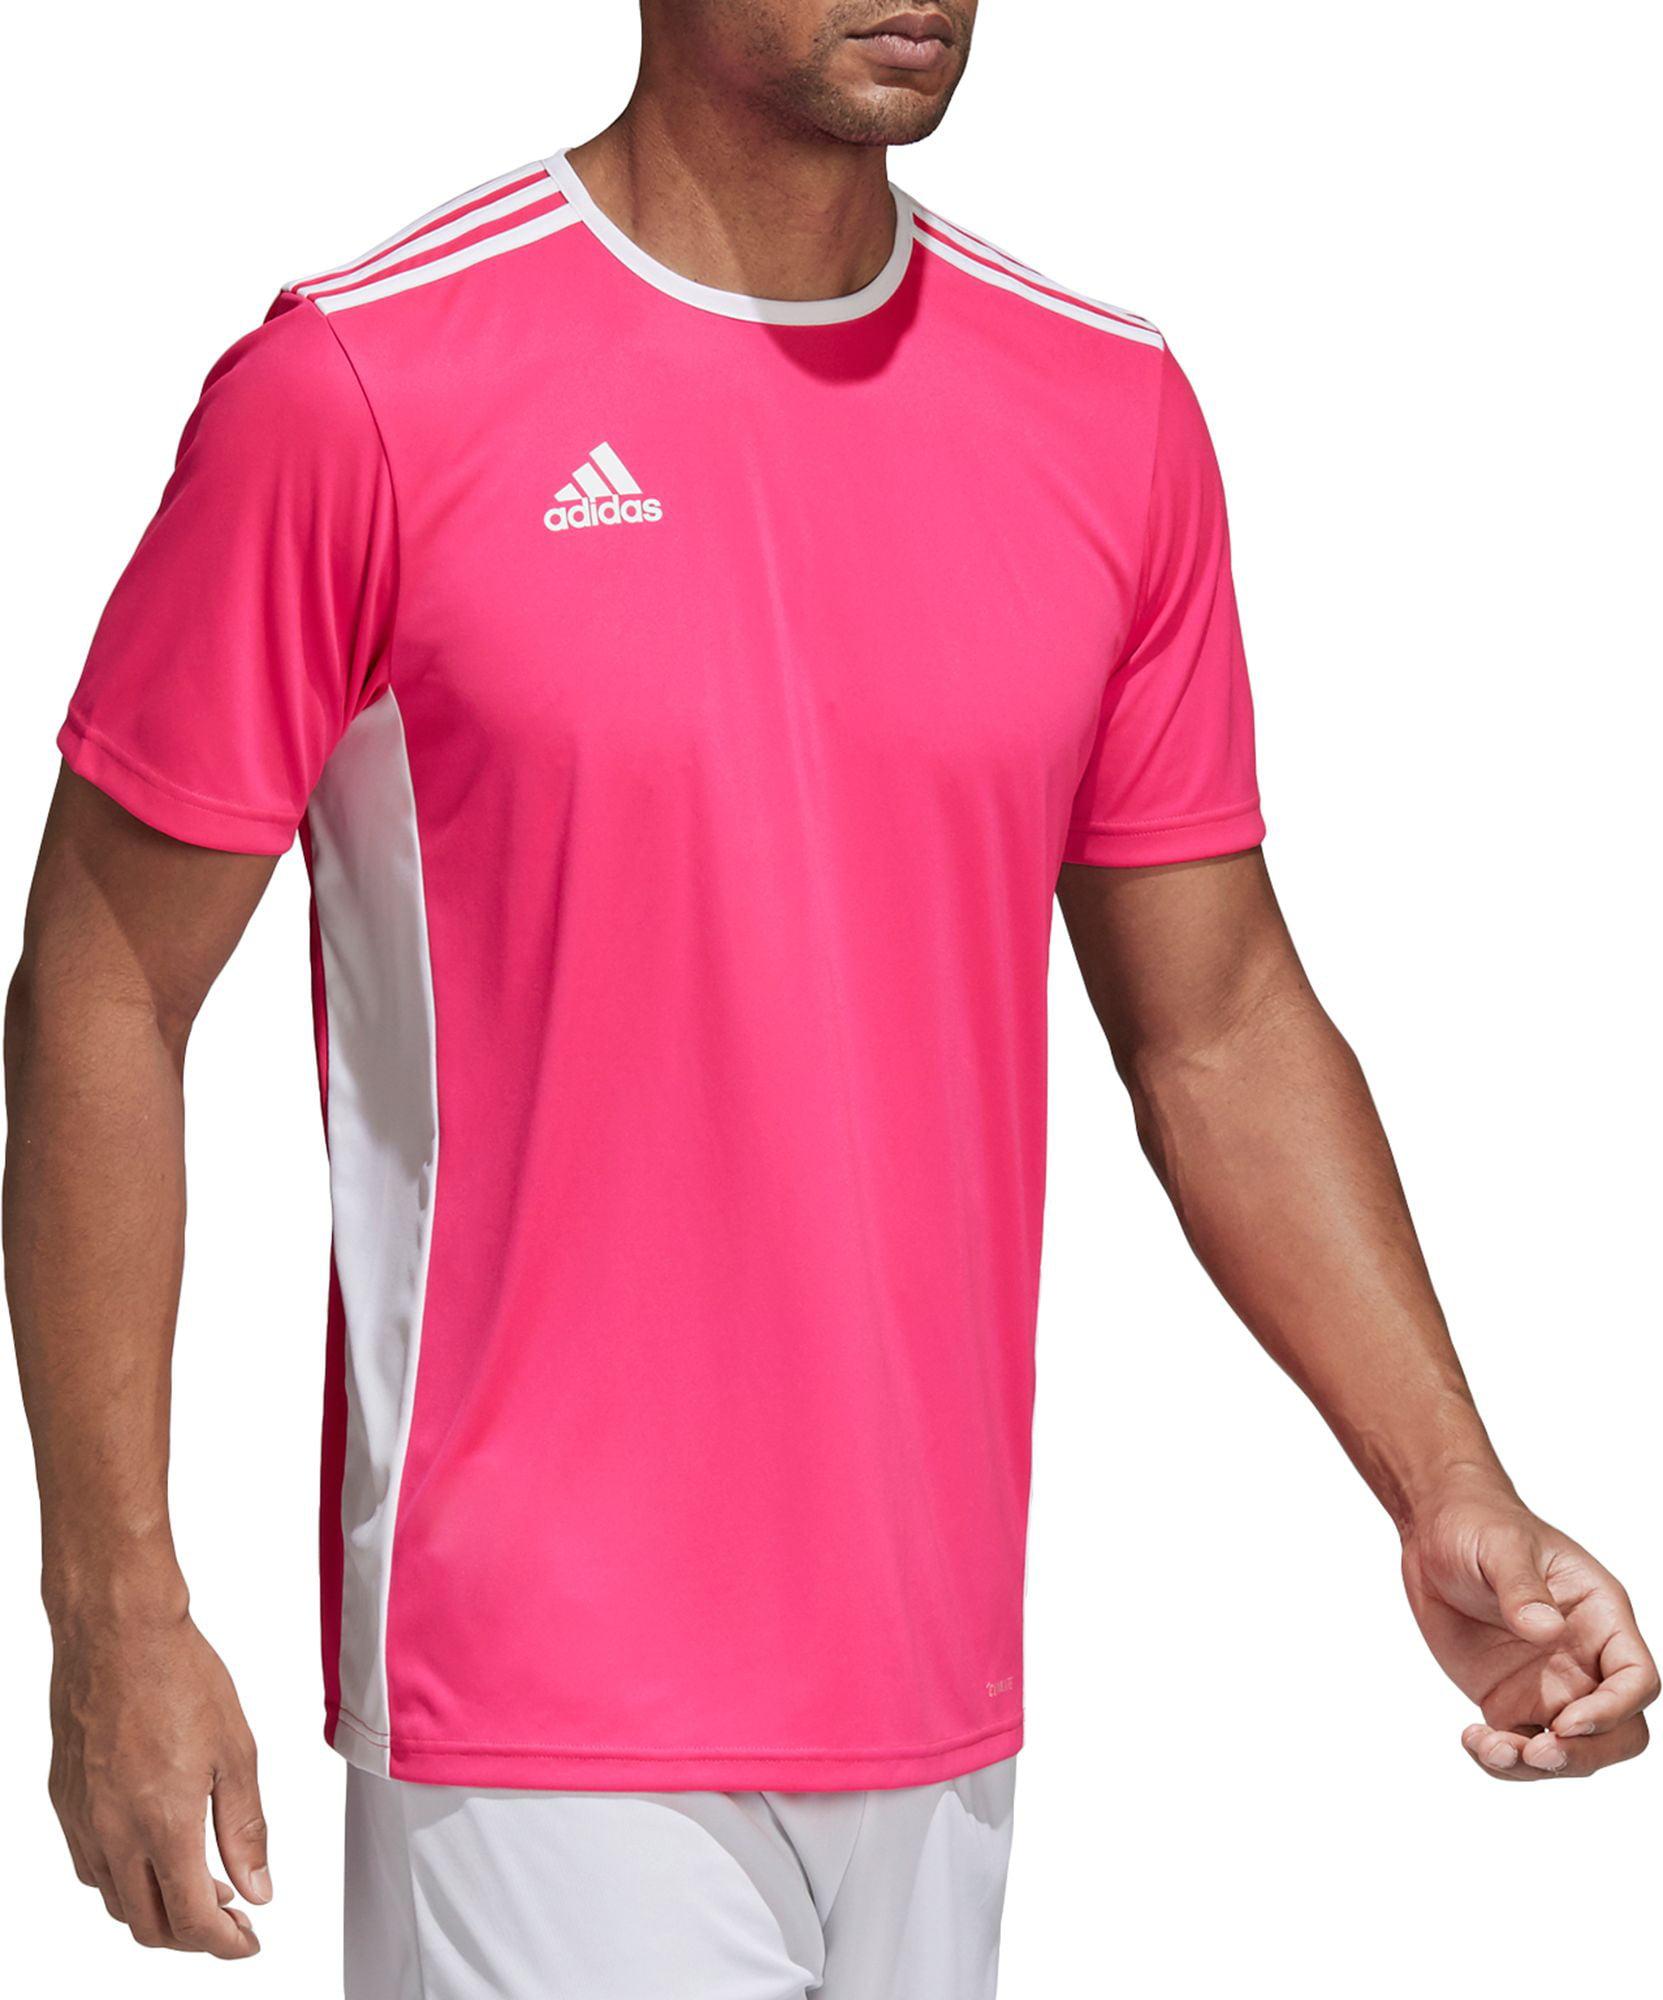 adidas Men's Entrada 18 Soccer Jersey - Walmart.com